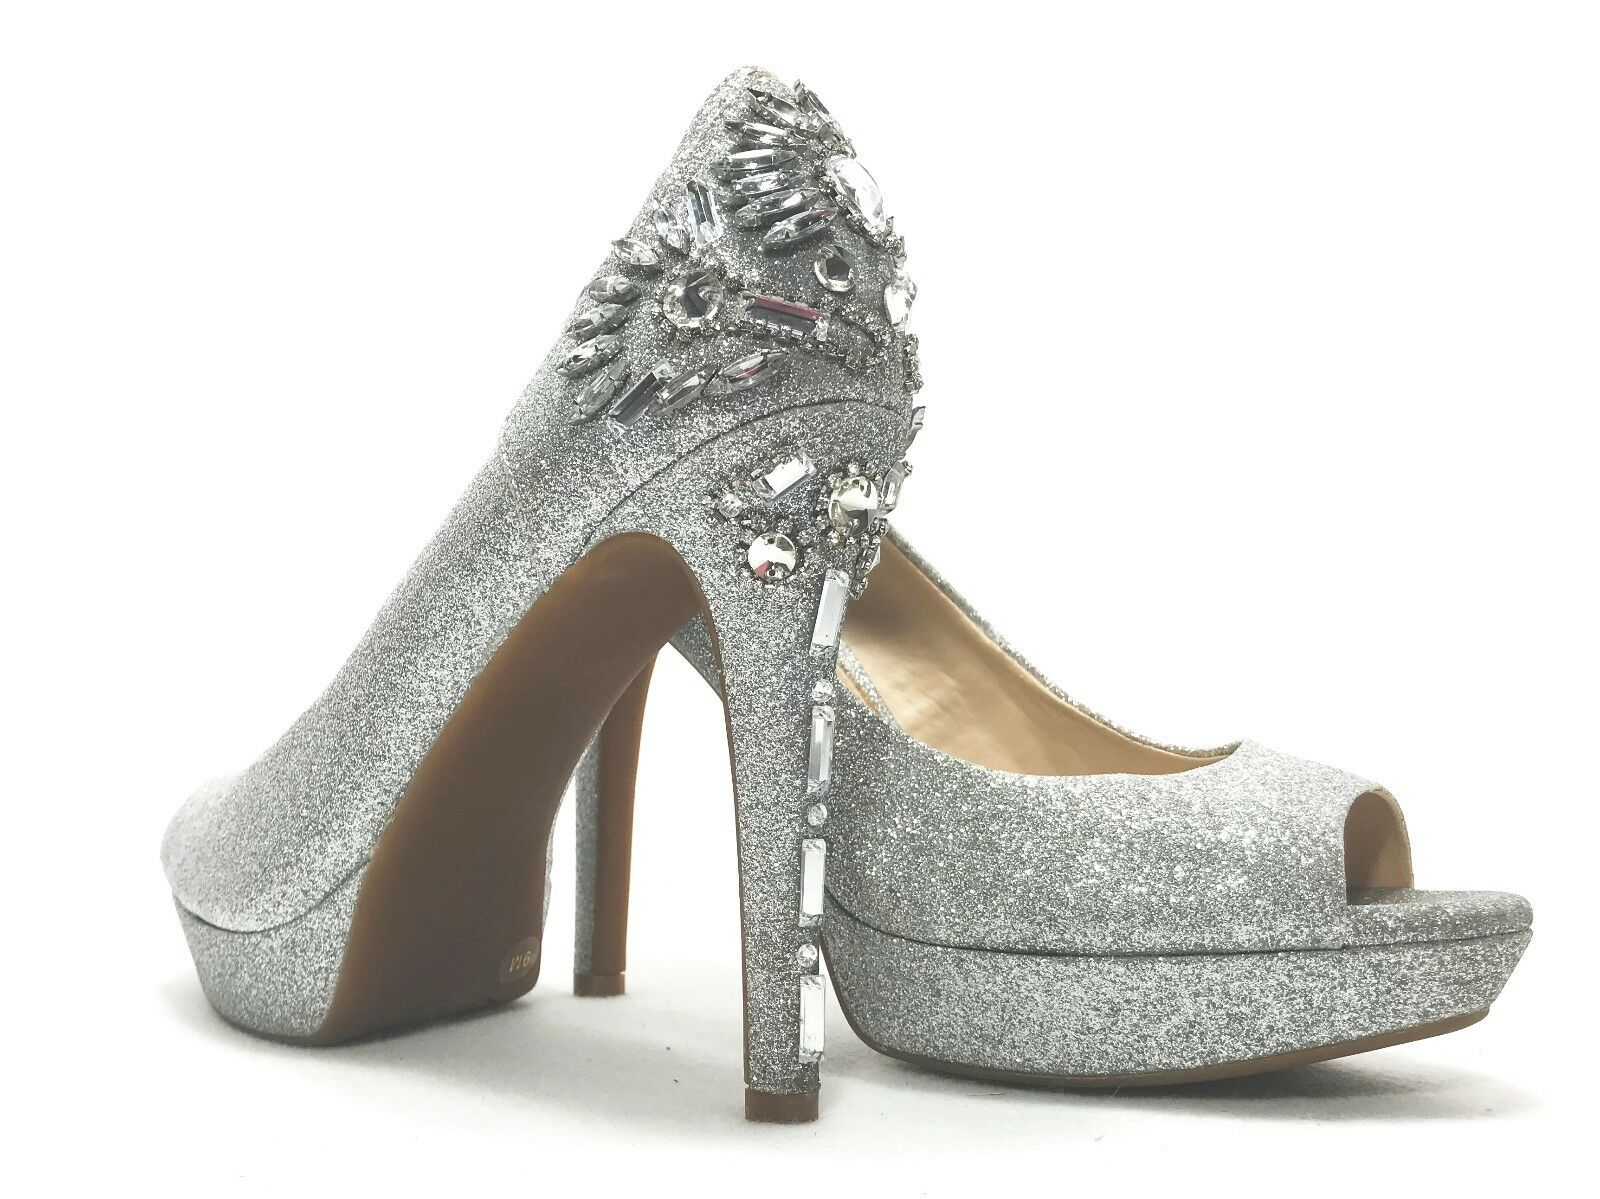 Gianni Bini para para para mujer Tacones plata Glitter Enjoyado Peep Agujero Zapato Boda Baile de Graduación Talla 9  Envio gratis en todas las ordenes